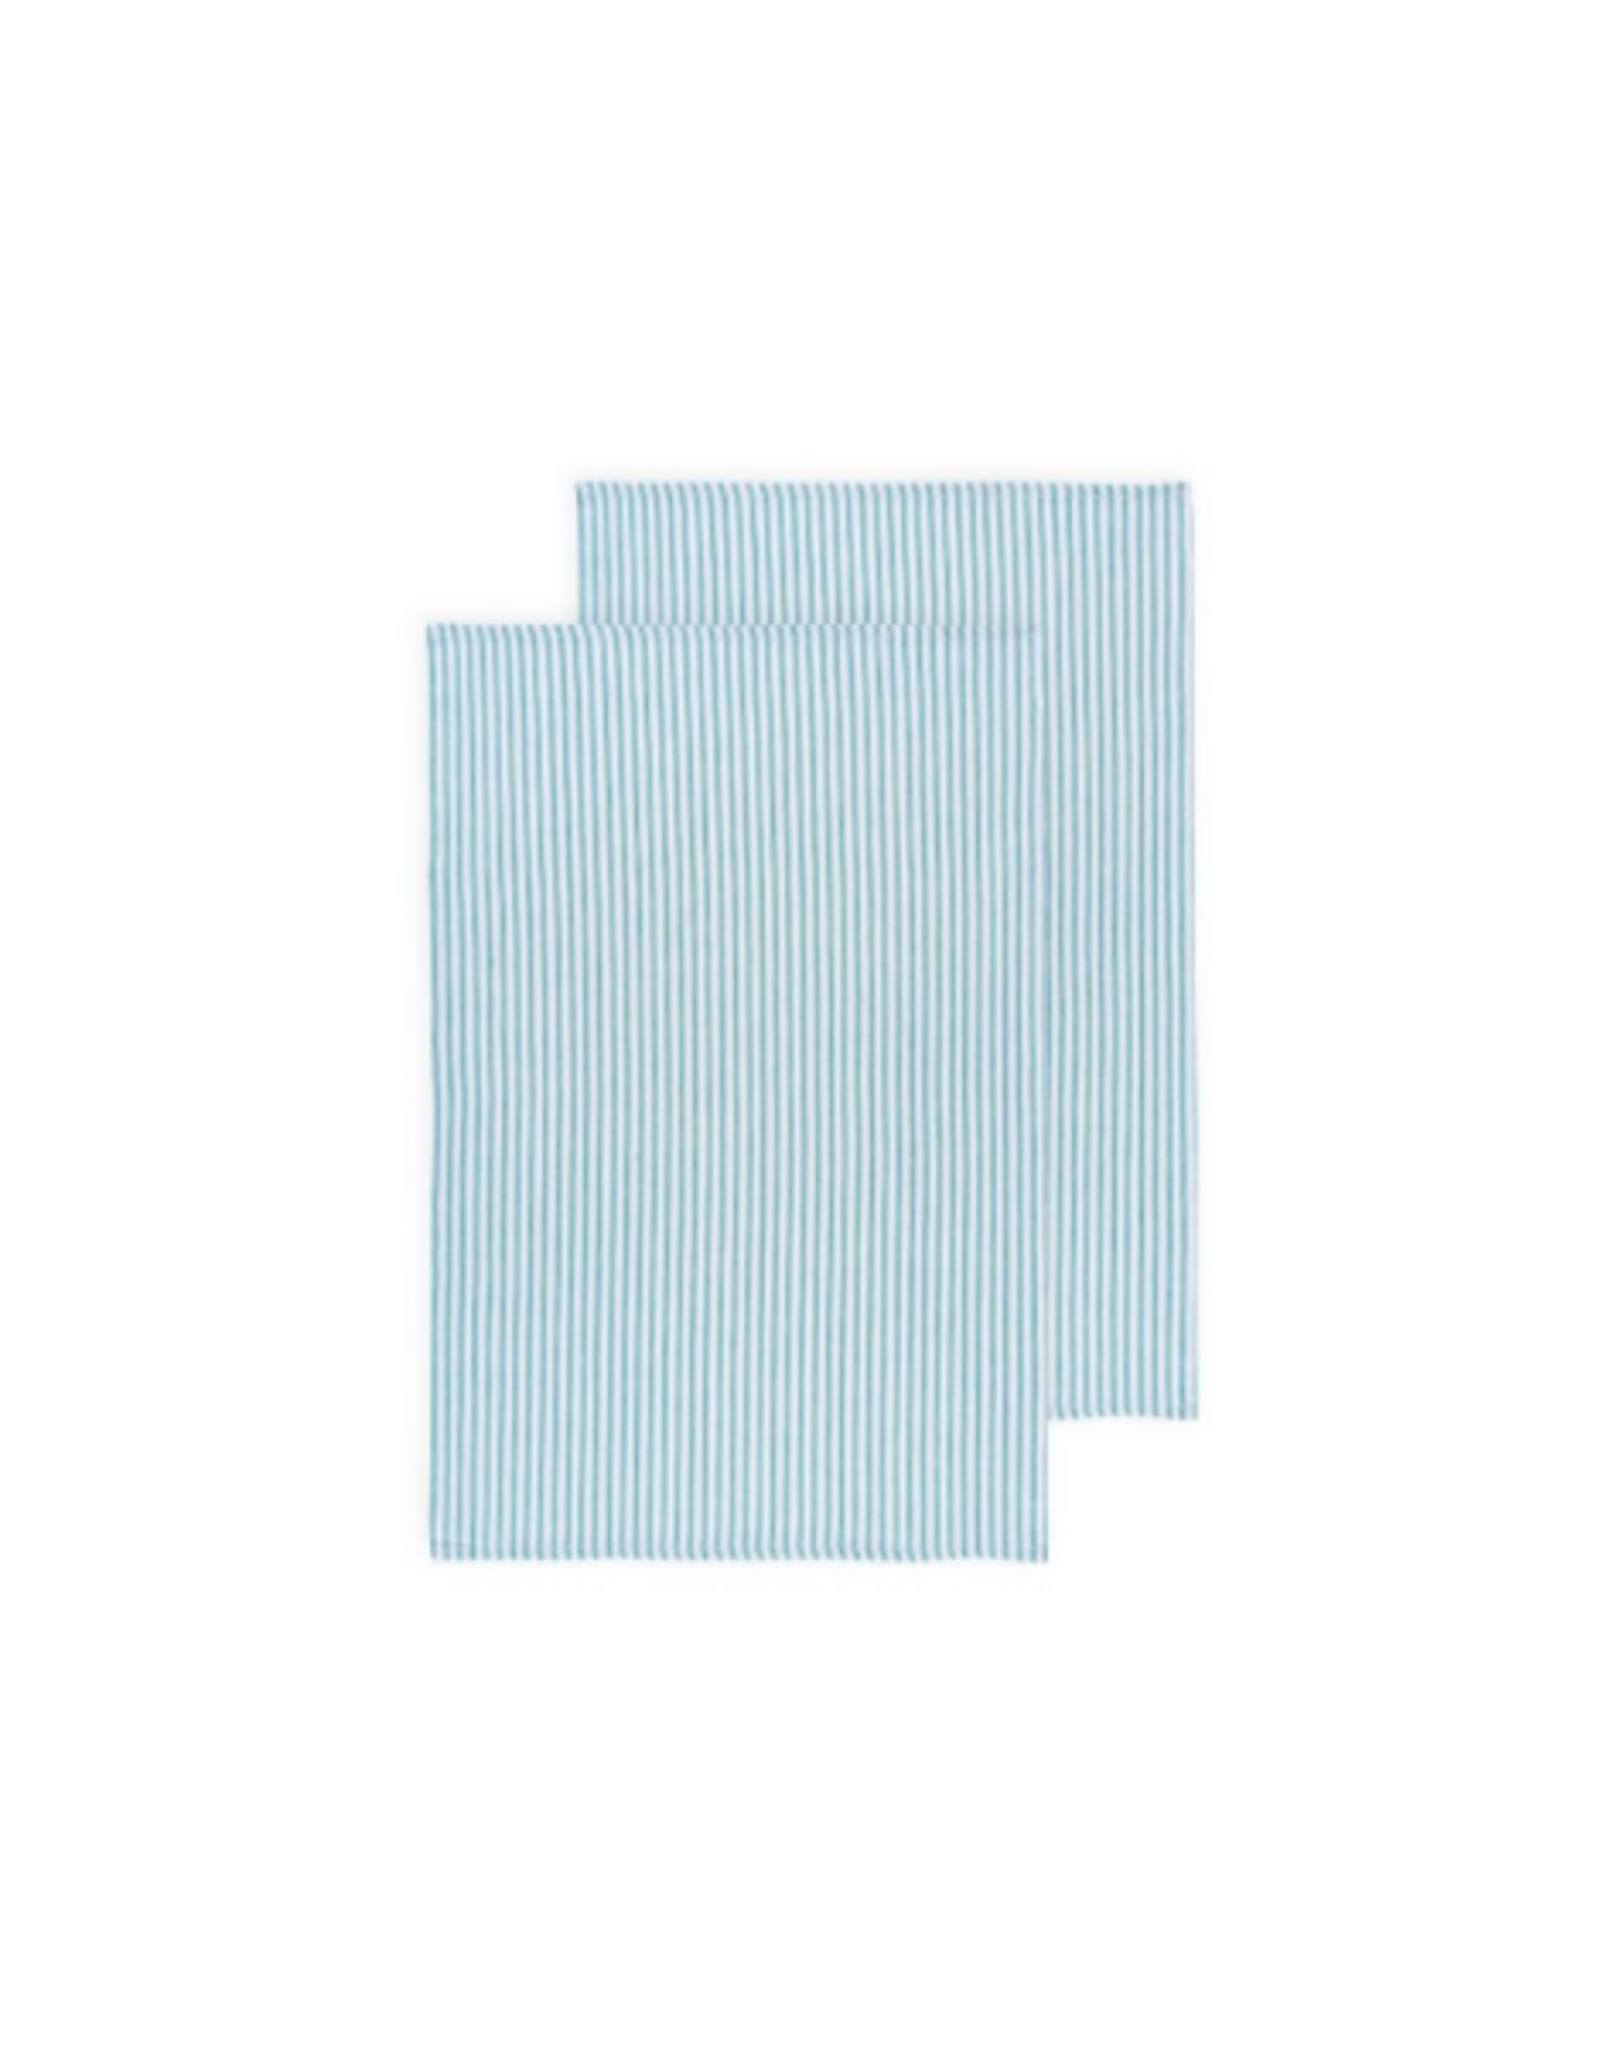 DCA - Glass Towel / Set 2, Turquoise Stripe